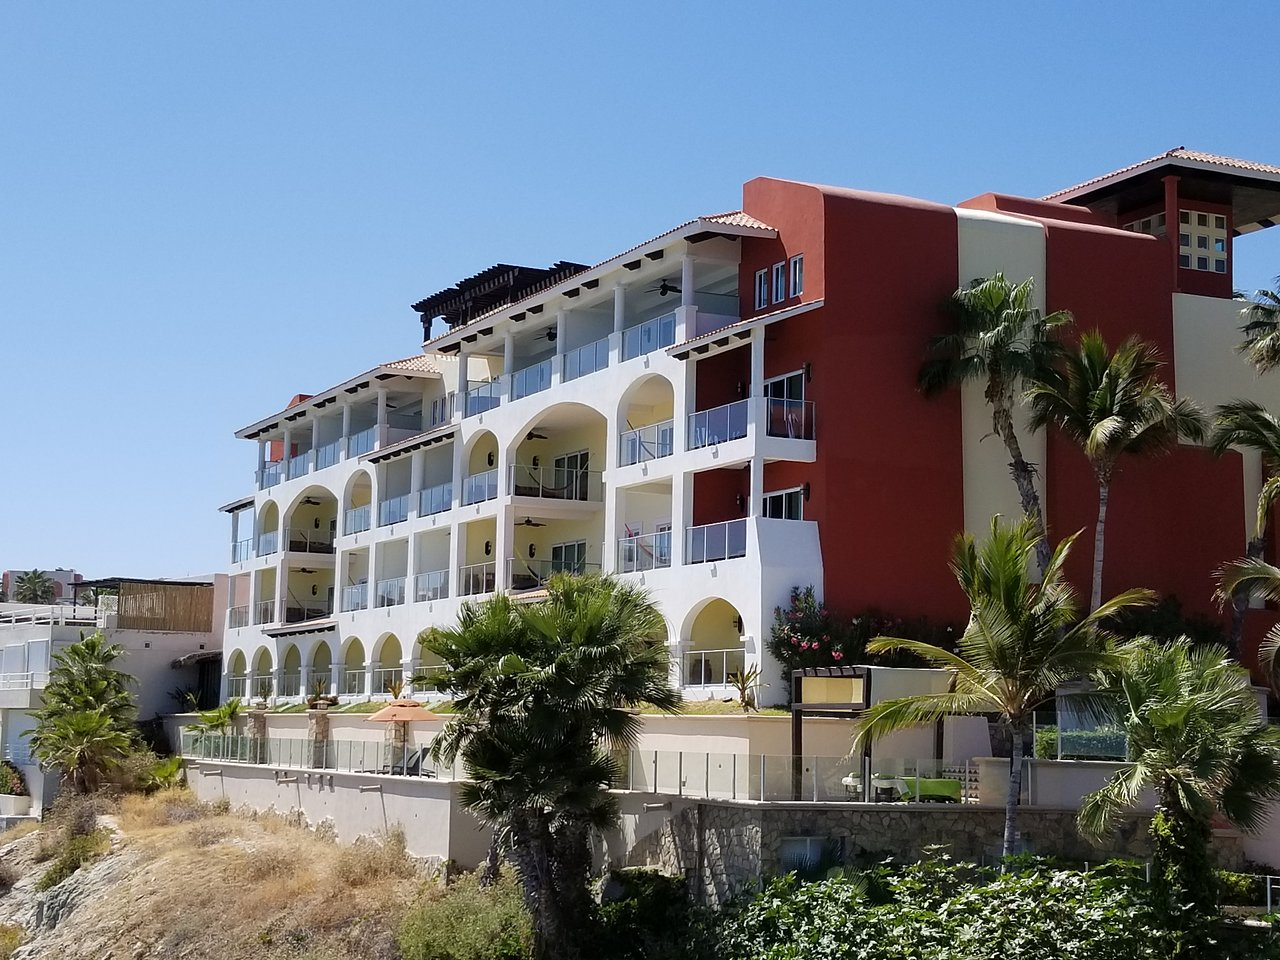 Welk_Resorts_Cabo_San_Lucas_Sirena_del_Mar_Exterior_0cc215f279.jpg